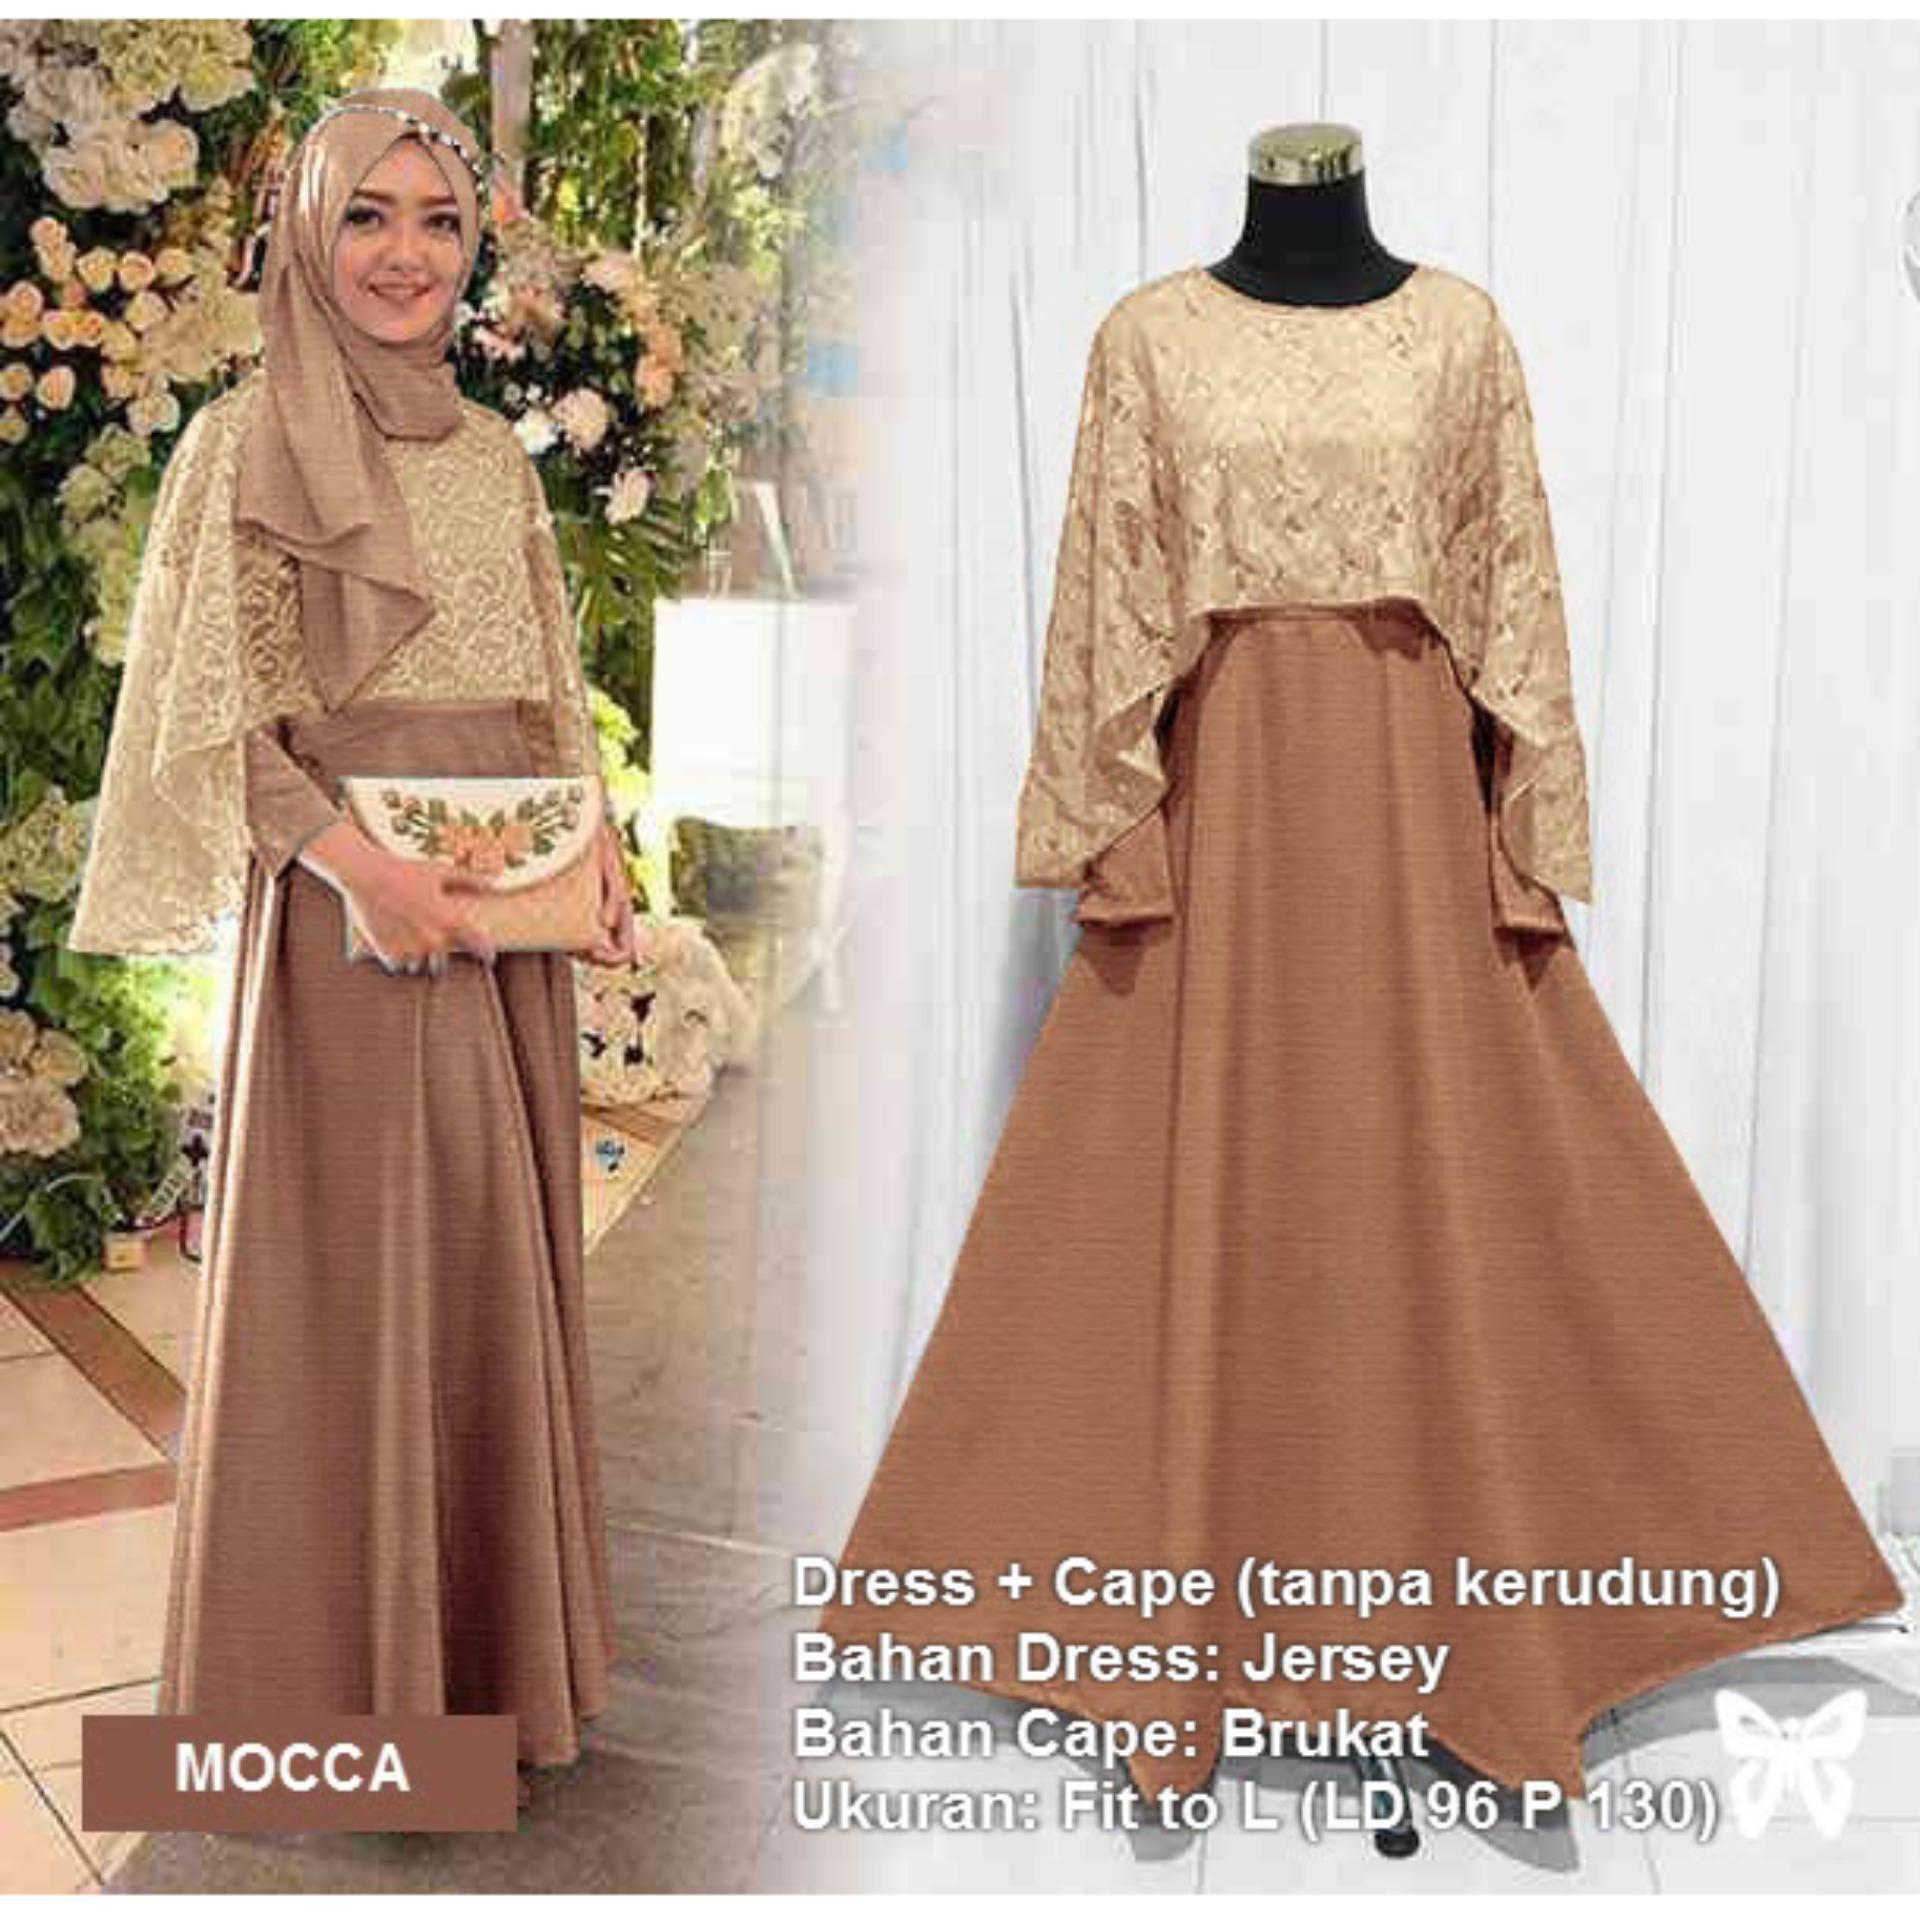 Maxi Dress Lengan Panjang Set 2 In 1 Cape Brukat Msr311 Gamis Syari Gaun Pesta Muslimah Baju Muslim Wanita Syar I Hijab Kebaya Modern Brokat